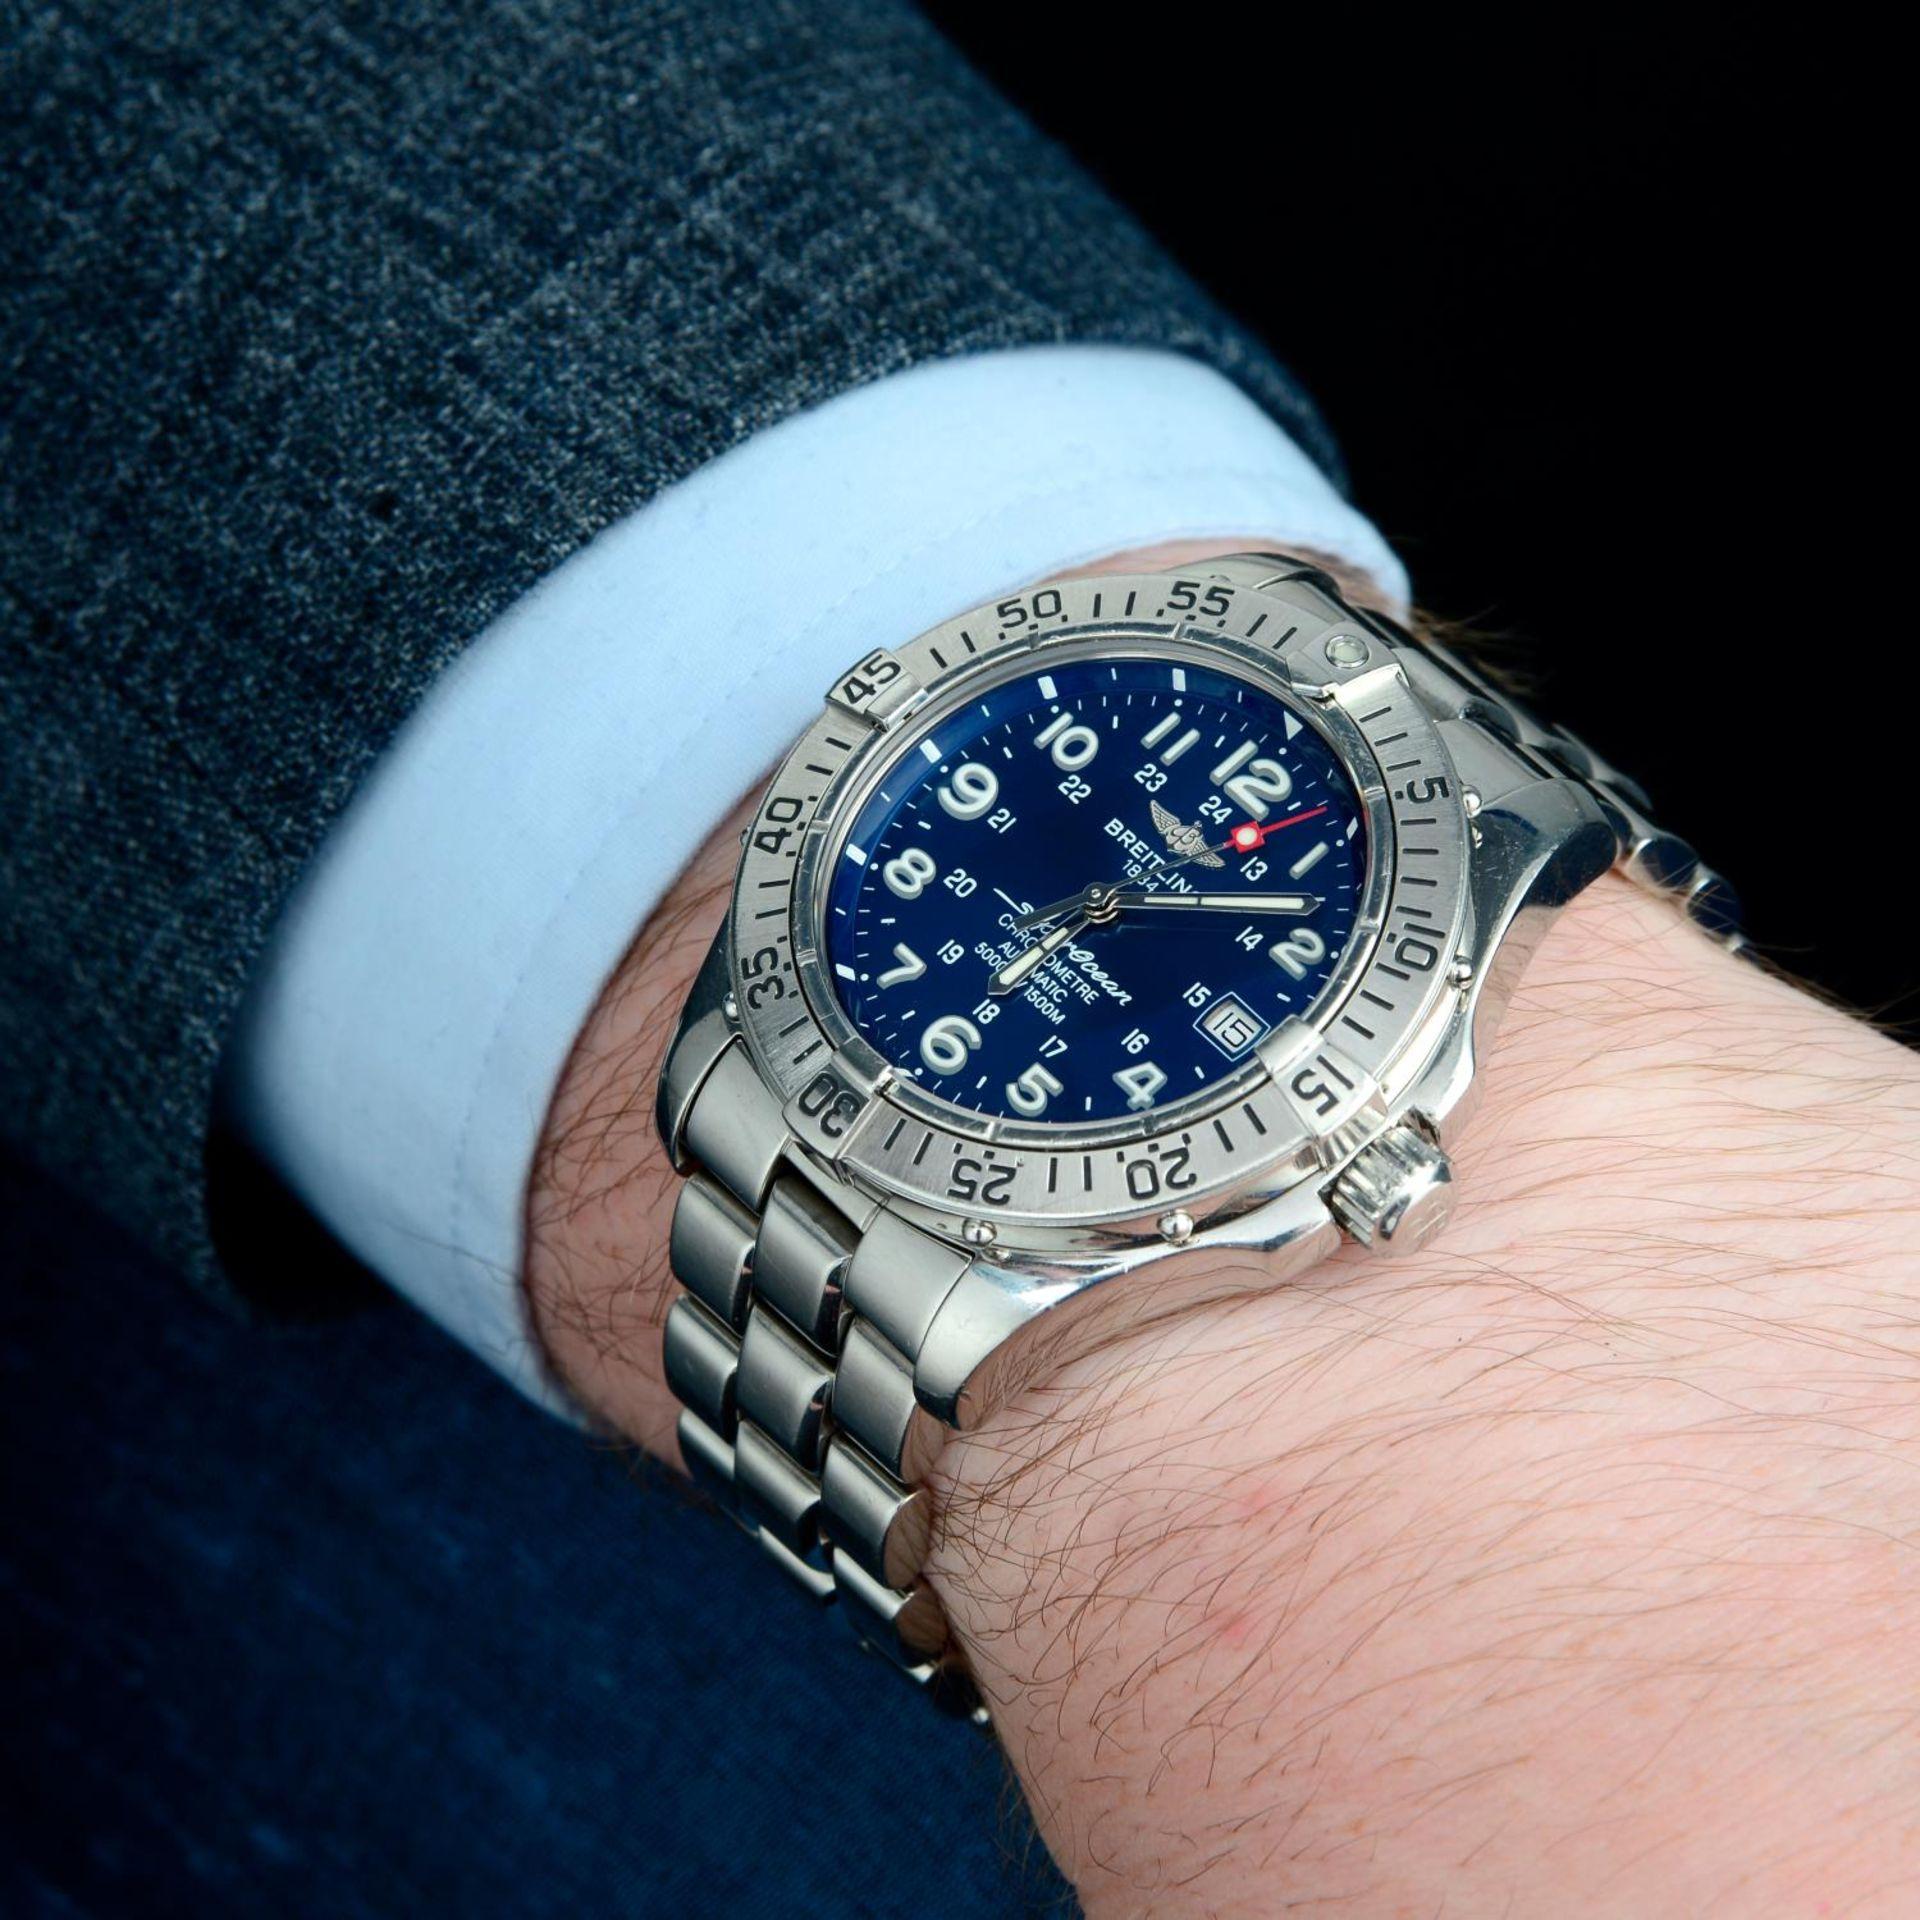 BREITLING - a SuperOcean bracelet watch. - Bild 3 aus 5